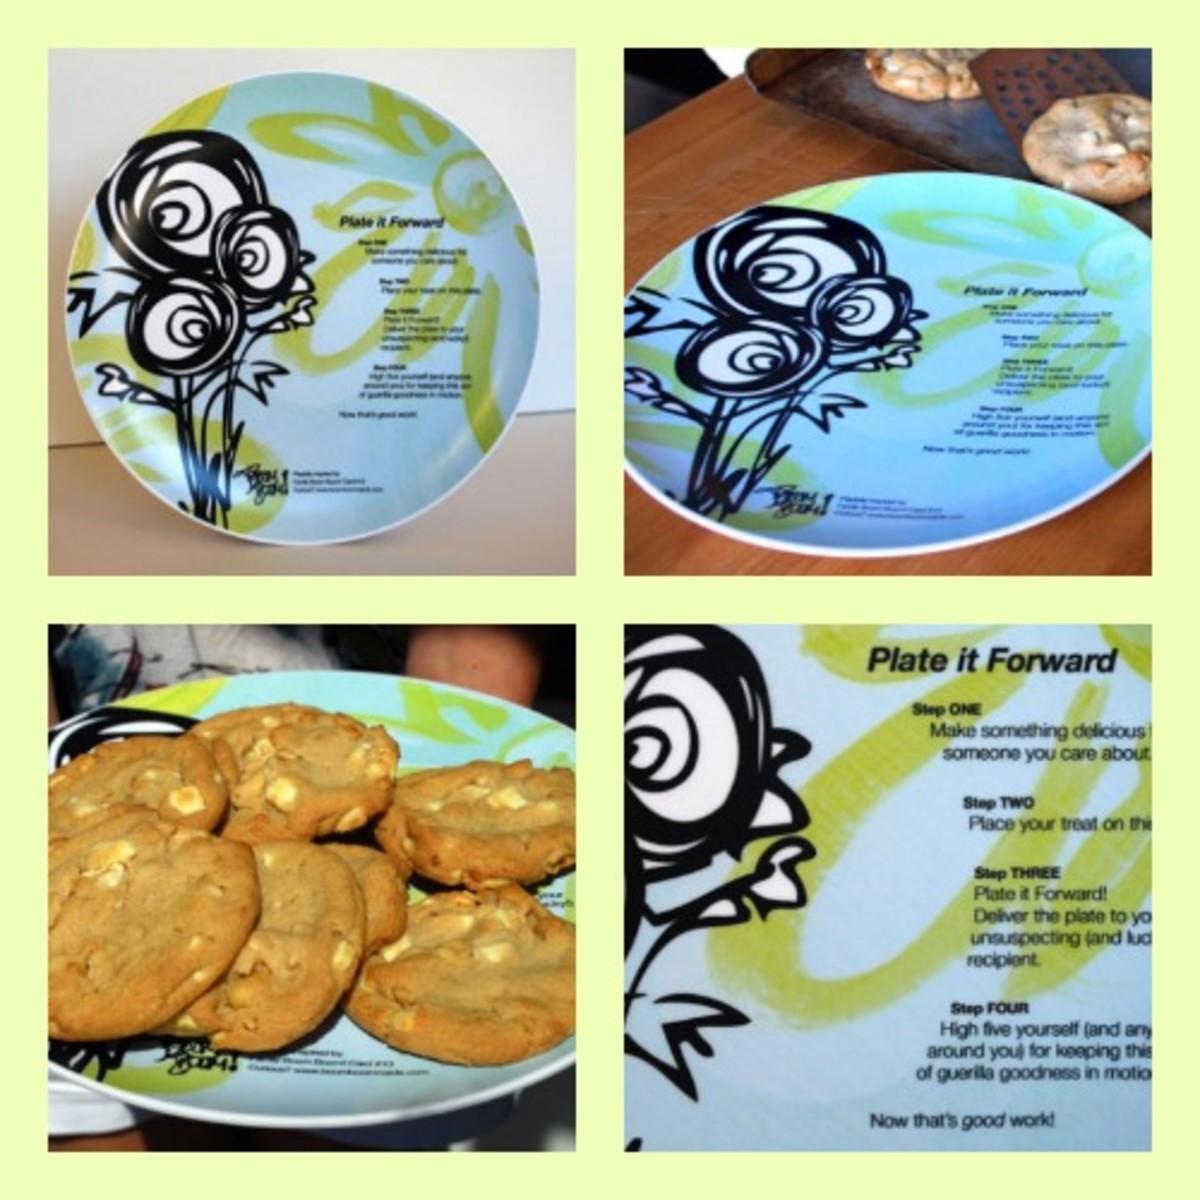 plate_it_forward